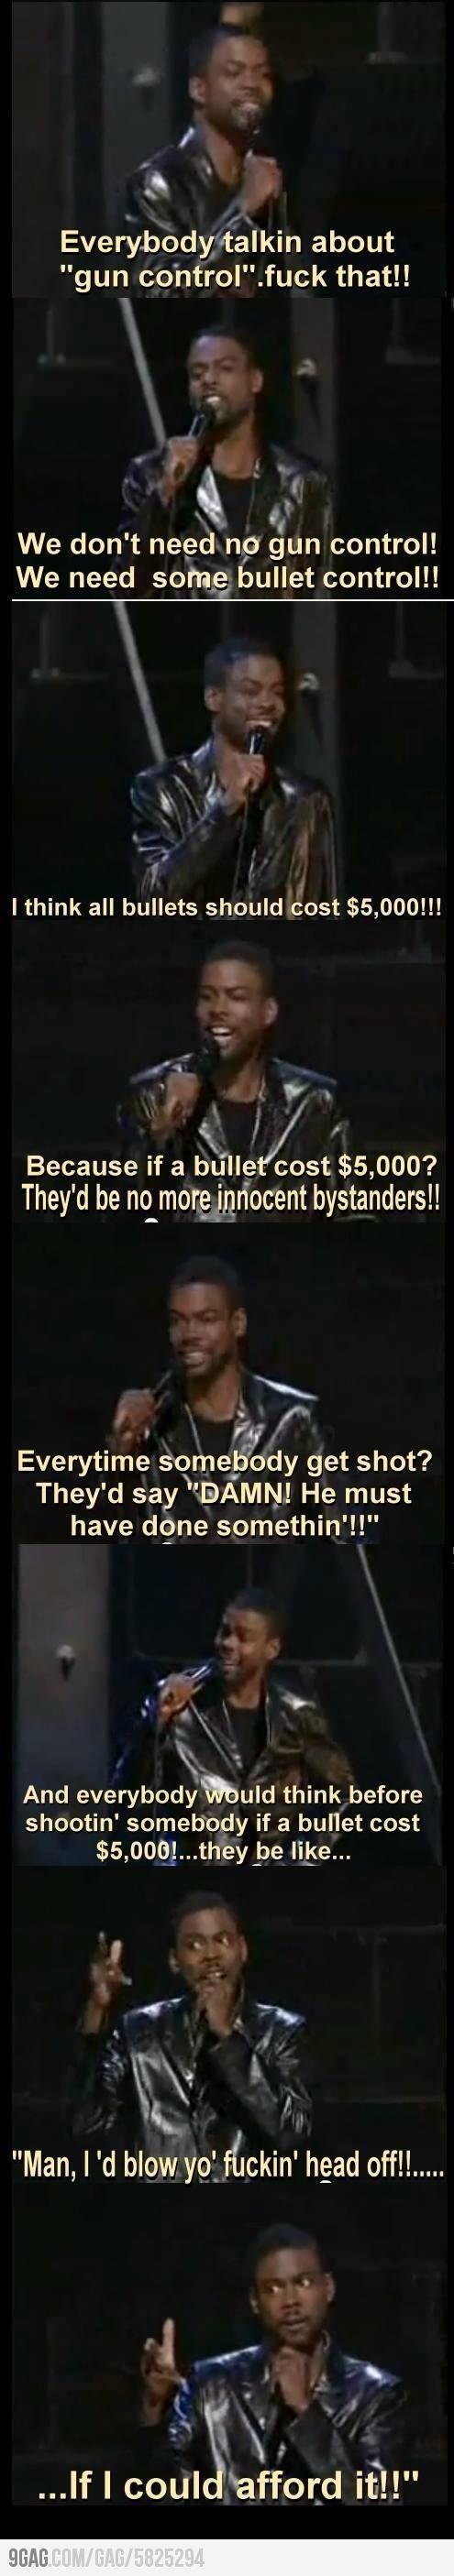 Chris Rock on Gun Control. SO true!!